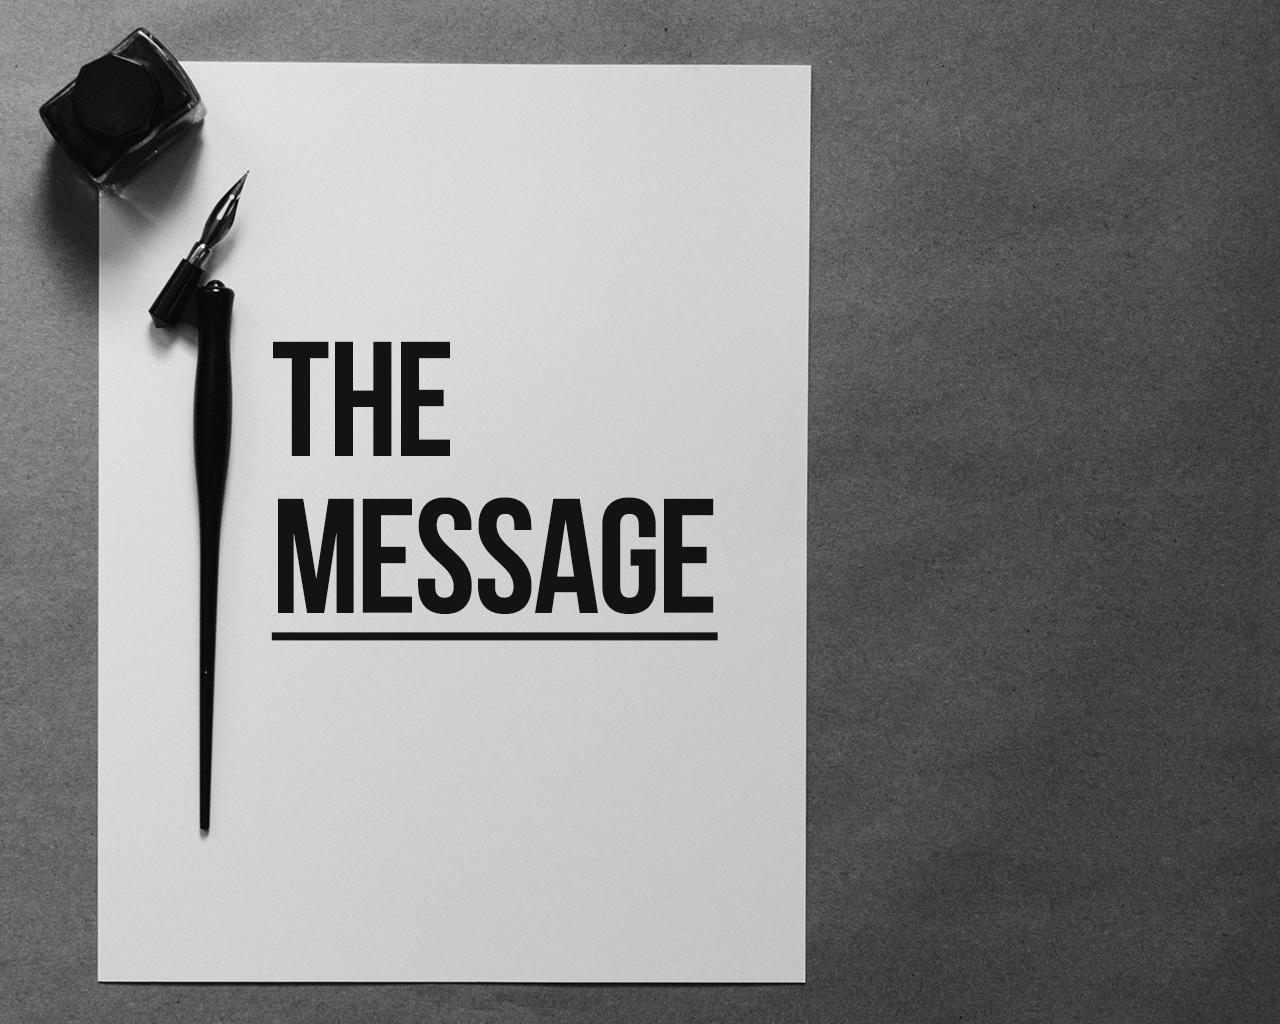 TheMessage.jpg